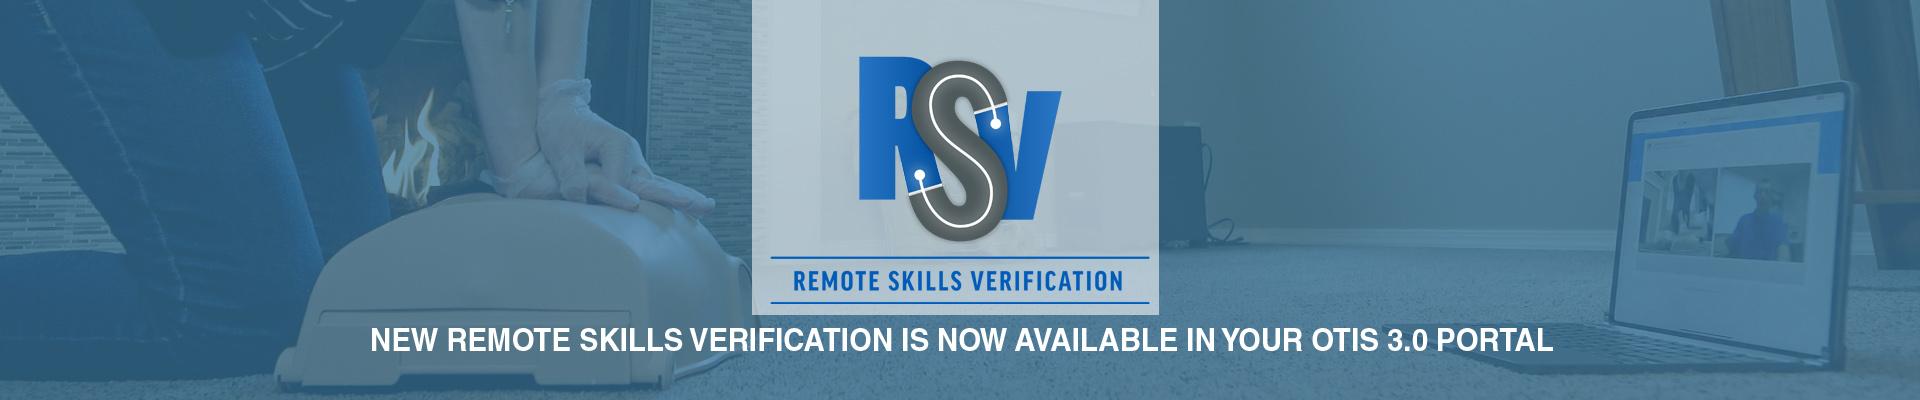 Remote Skills Verification